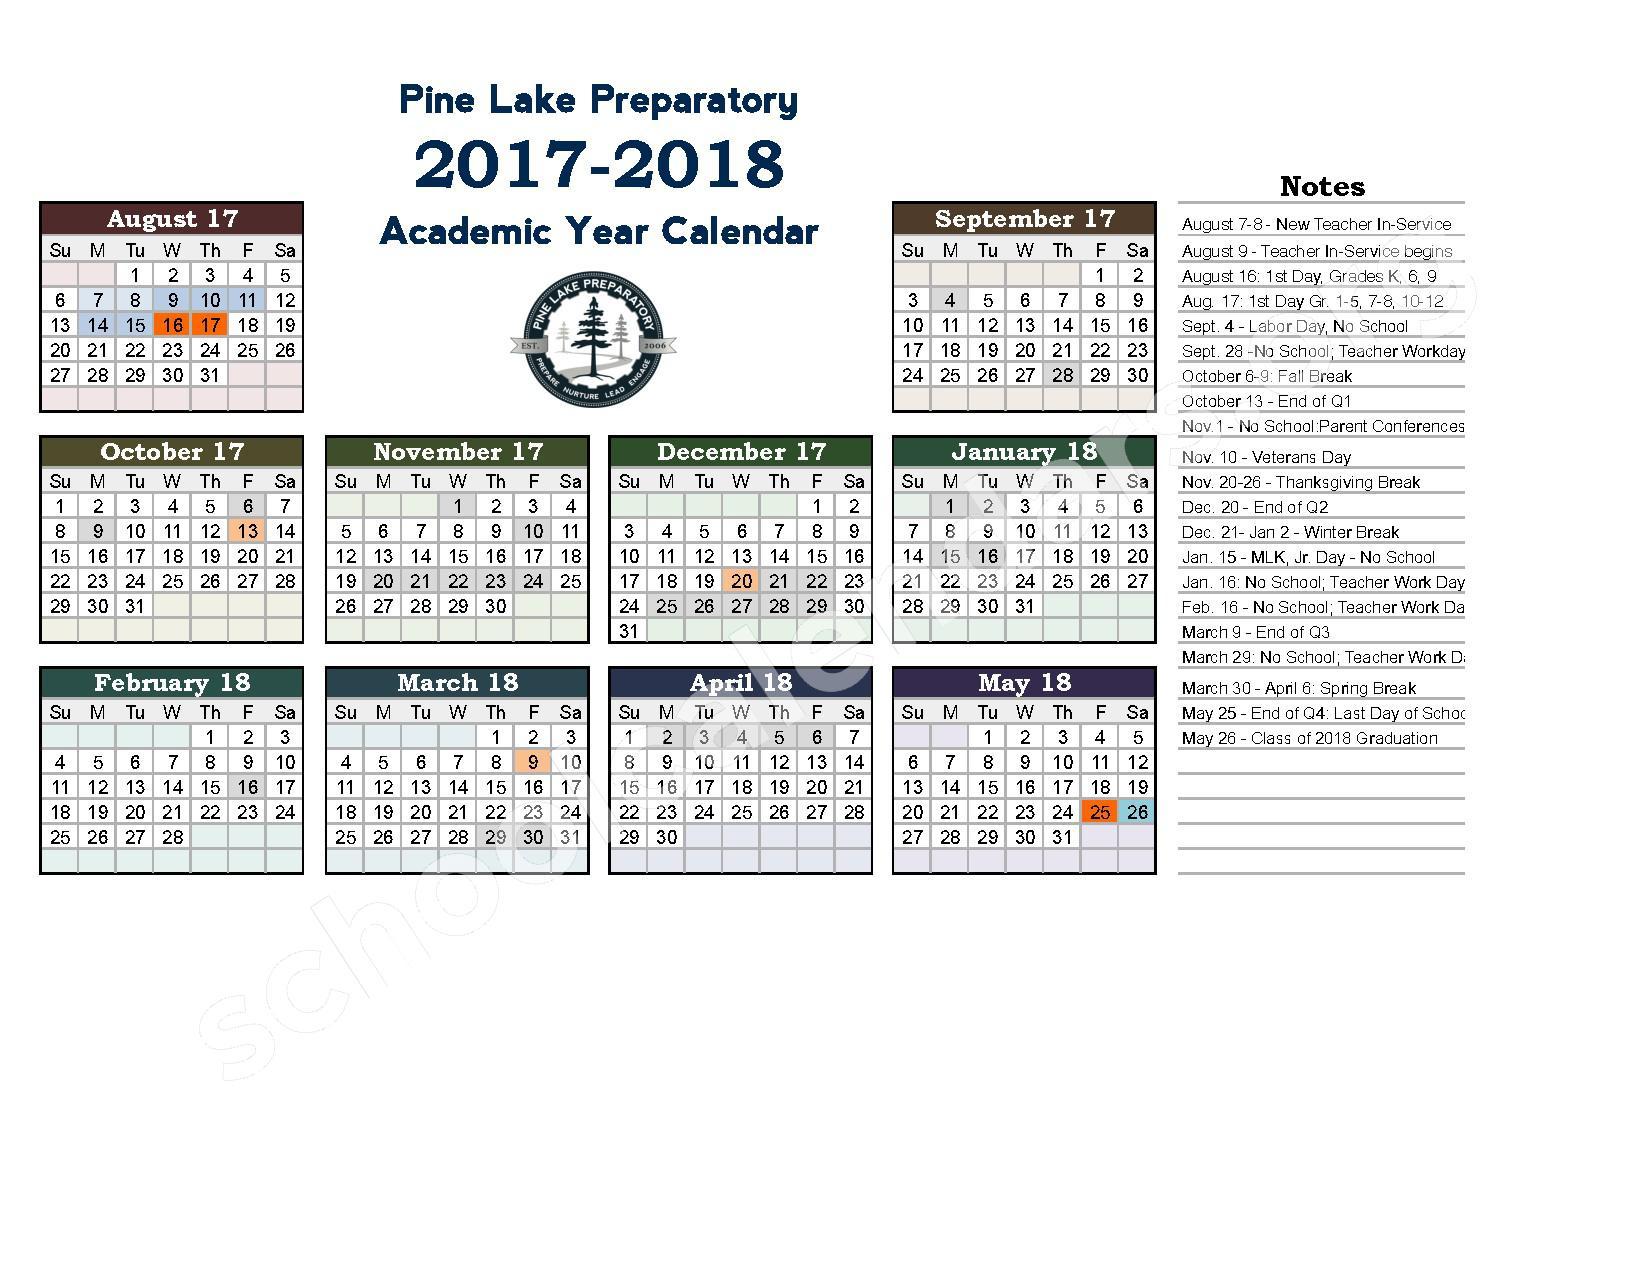 2017 - 2018 School Calendar – Pine Lake Preparatory – page 1